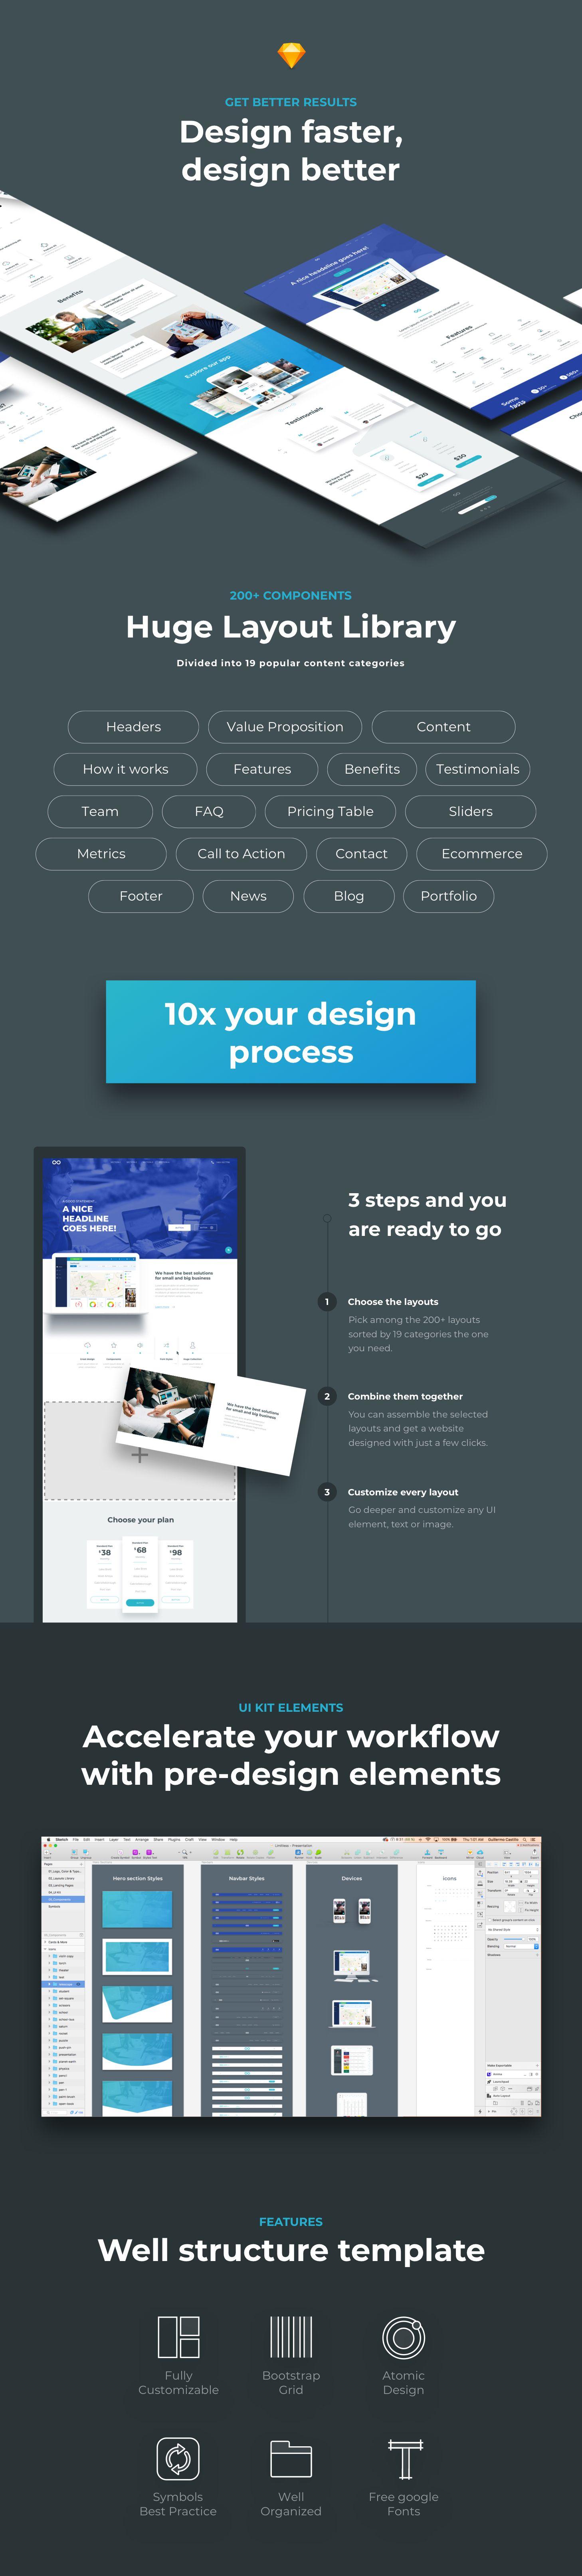 Limitless Web Design Projects Web Design Business Web Design